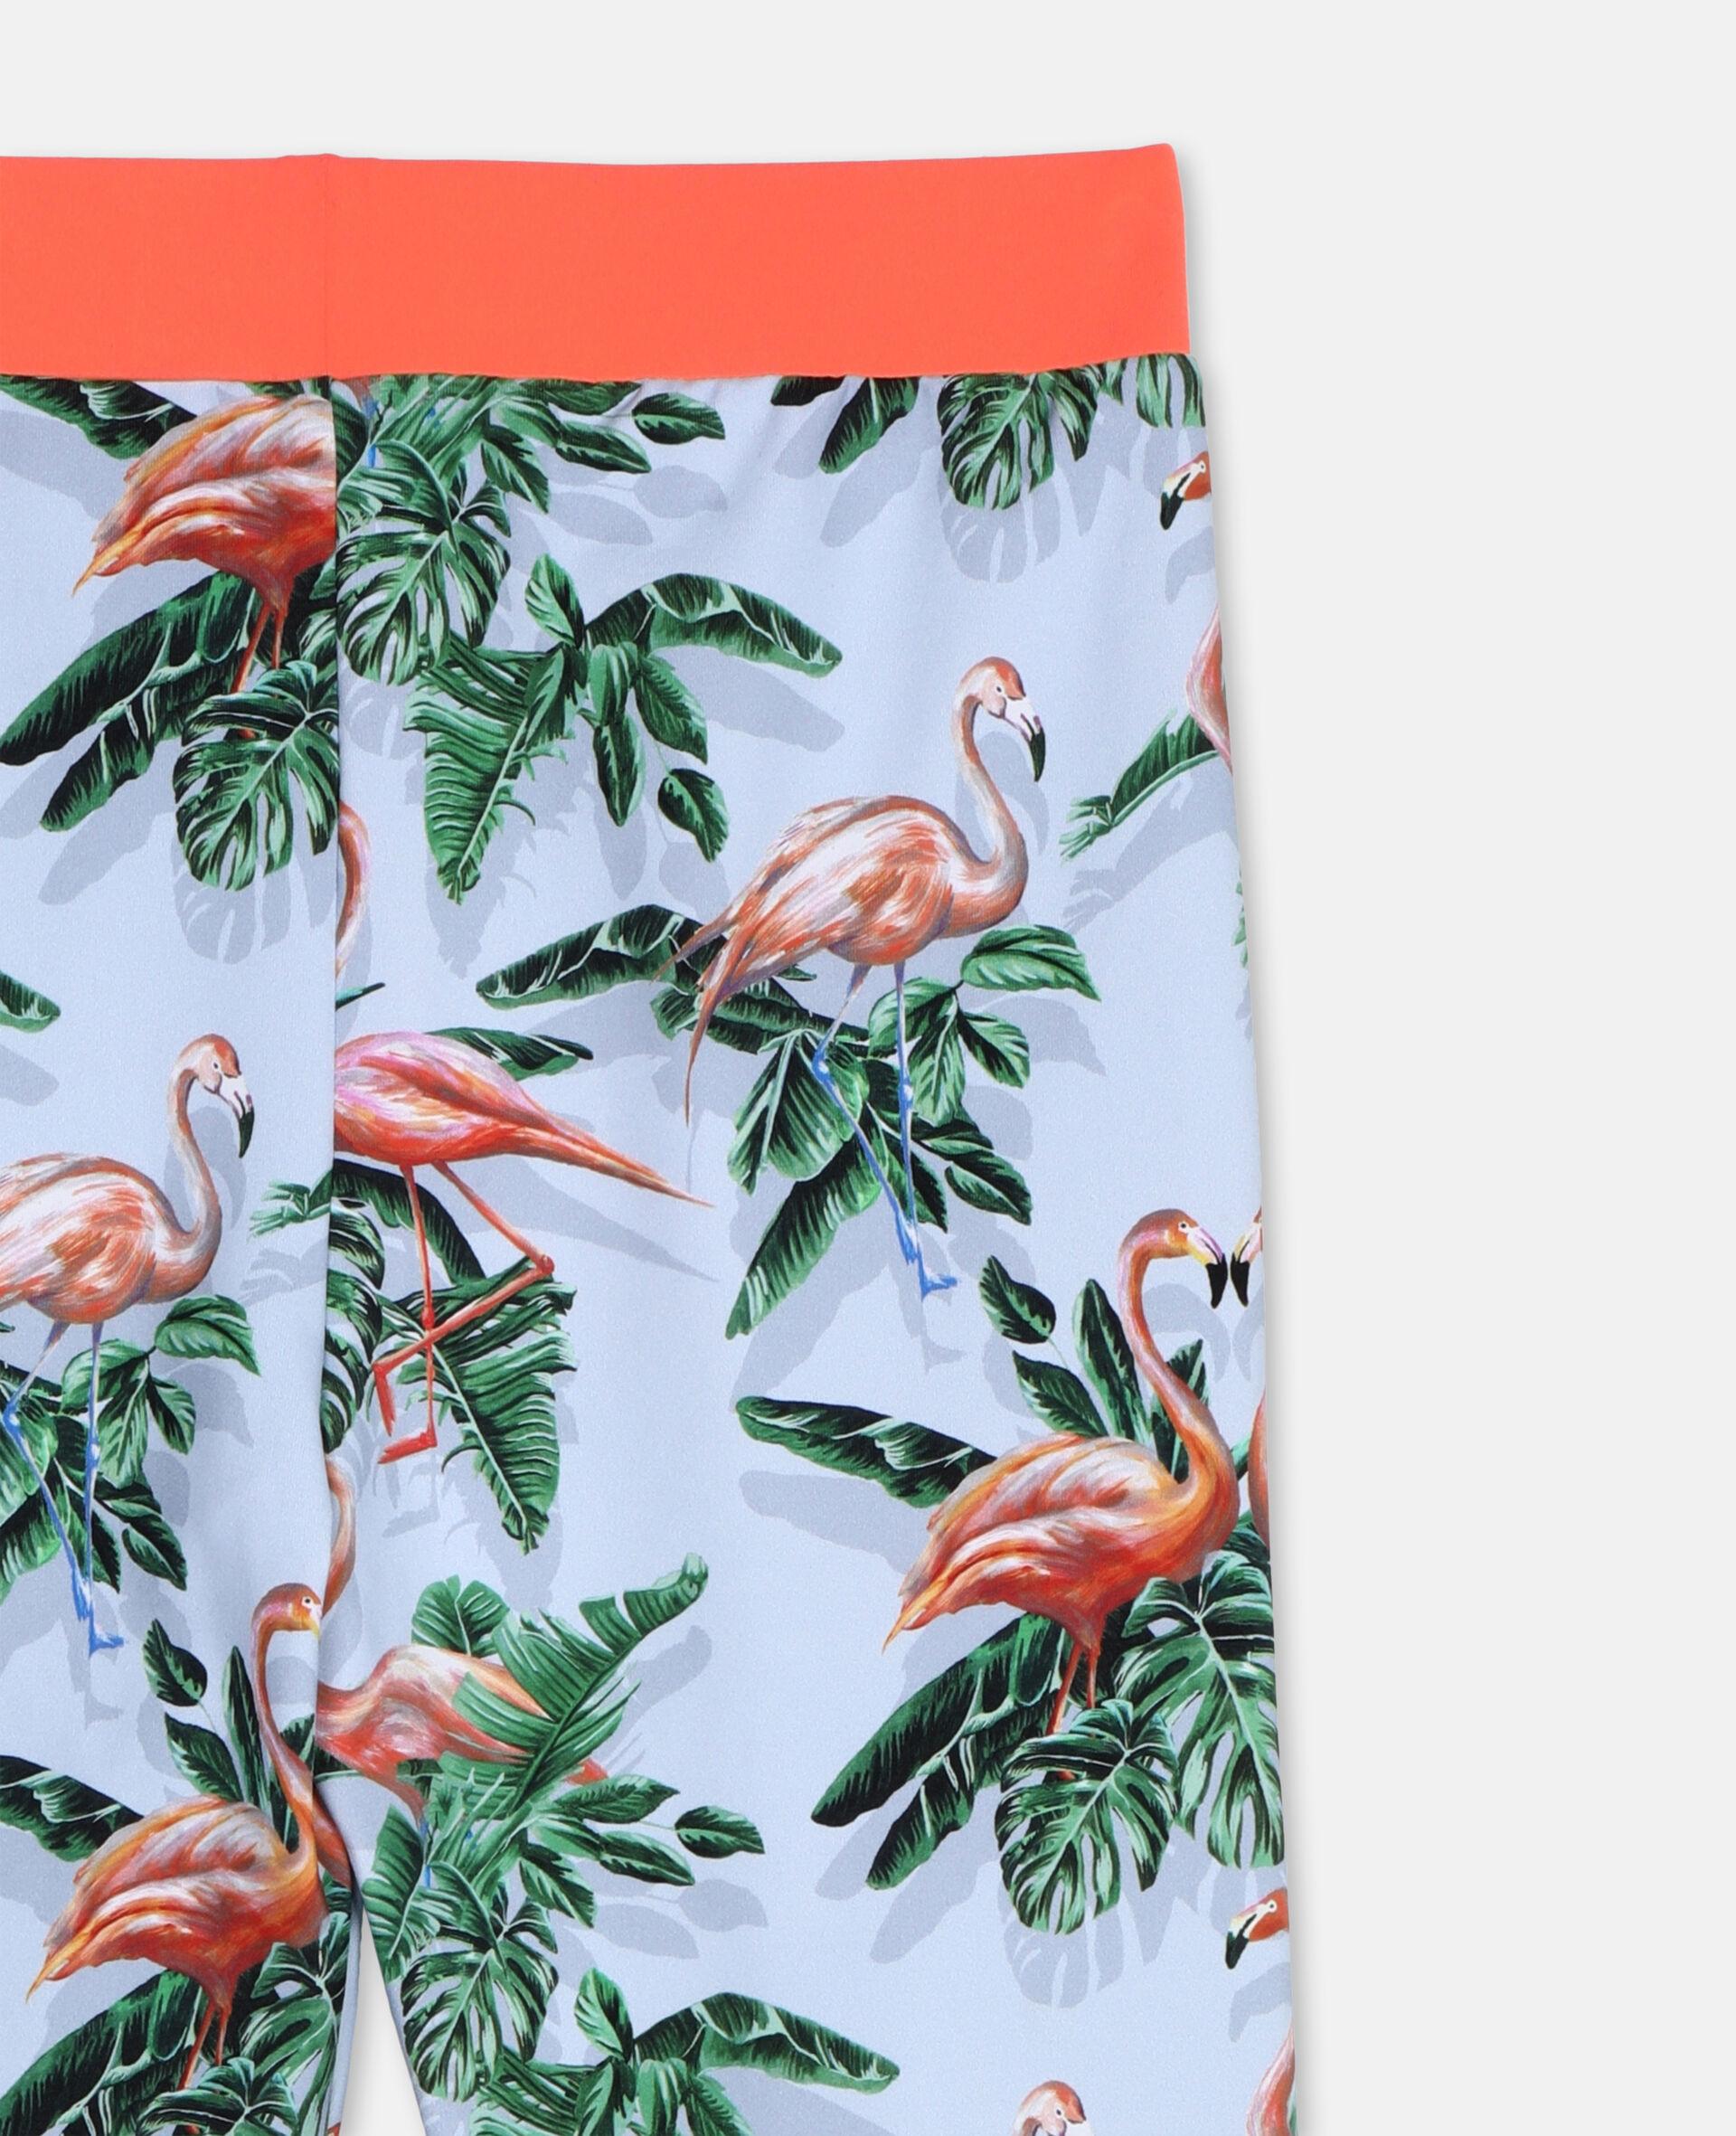 Painty Flamingo贴腿裤-绿色-large image number 2